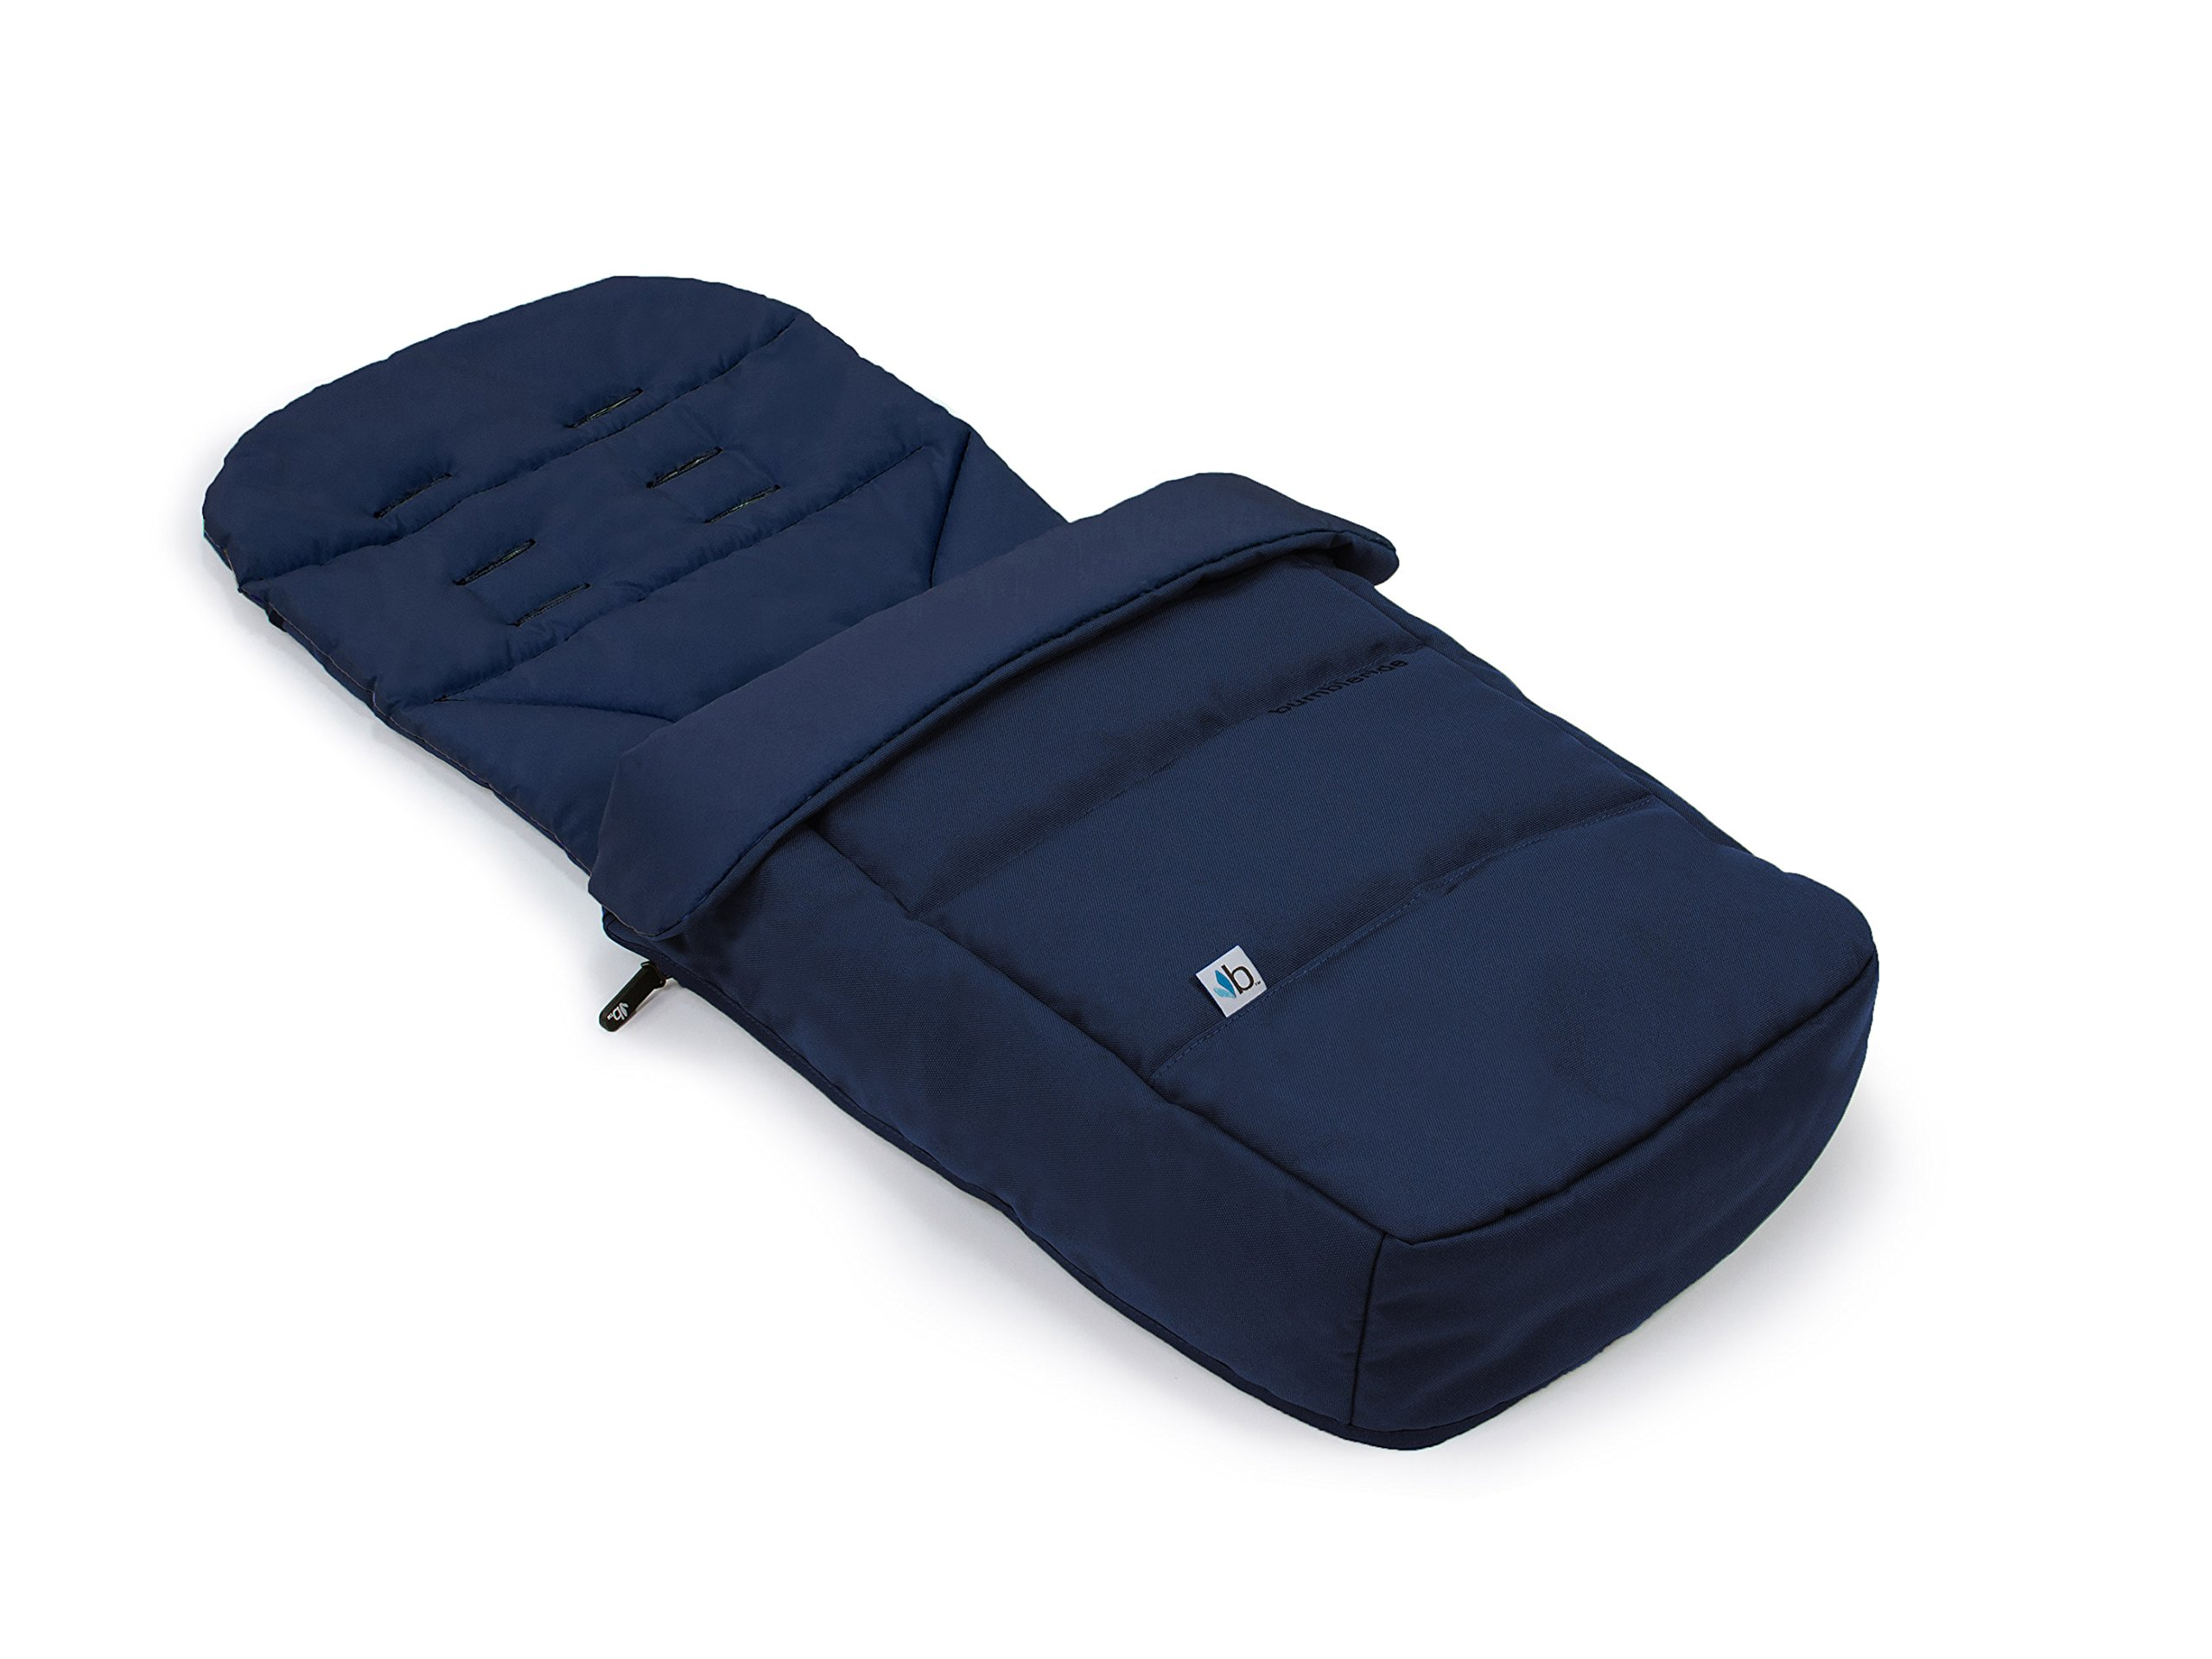 Bumbleride Stroller Footmuff Martime Blue, Maritime Blue, Standard by Bumbleride (Image #1)